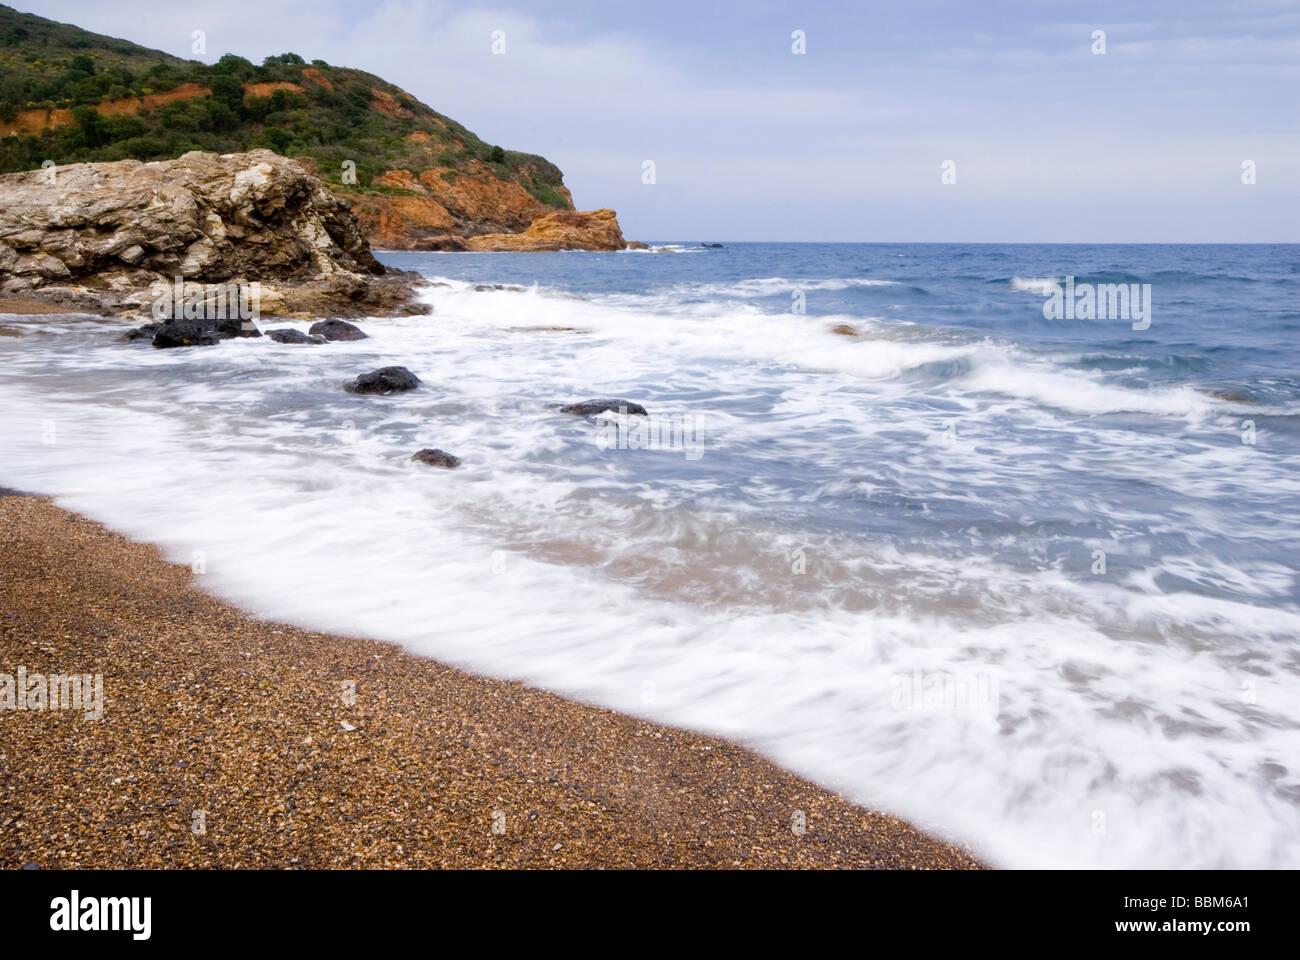 Breakers on Elba Island, Italy, Europe - Stock Image